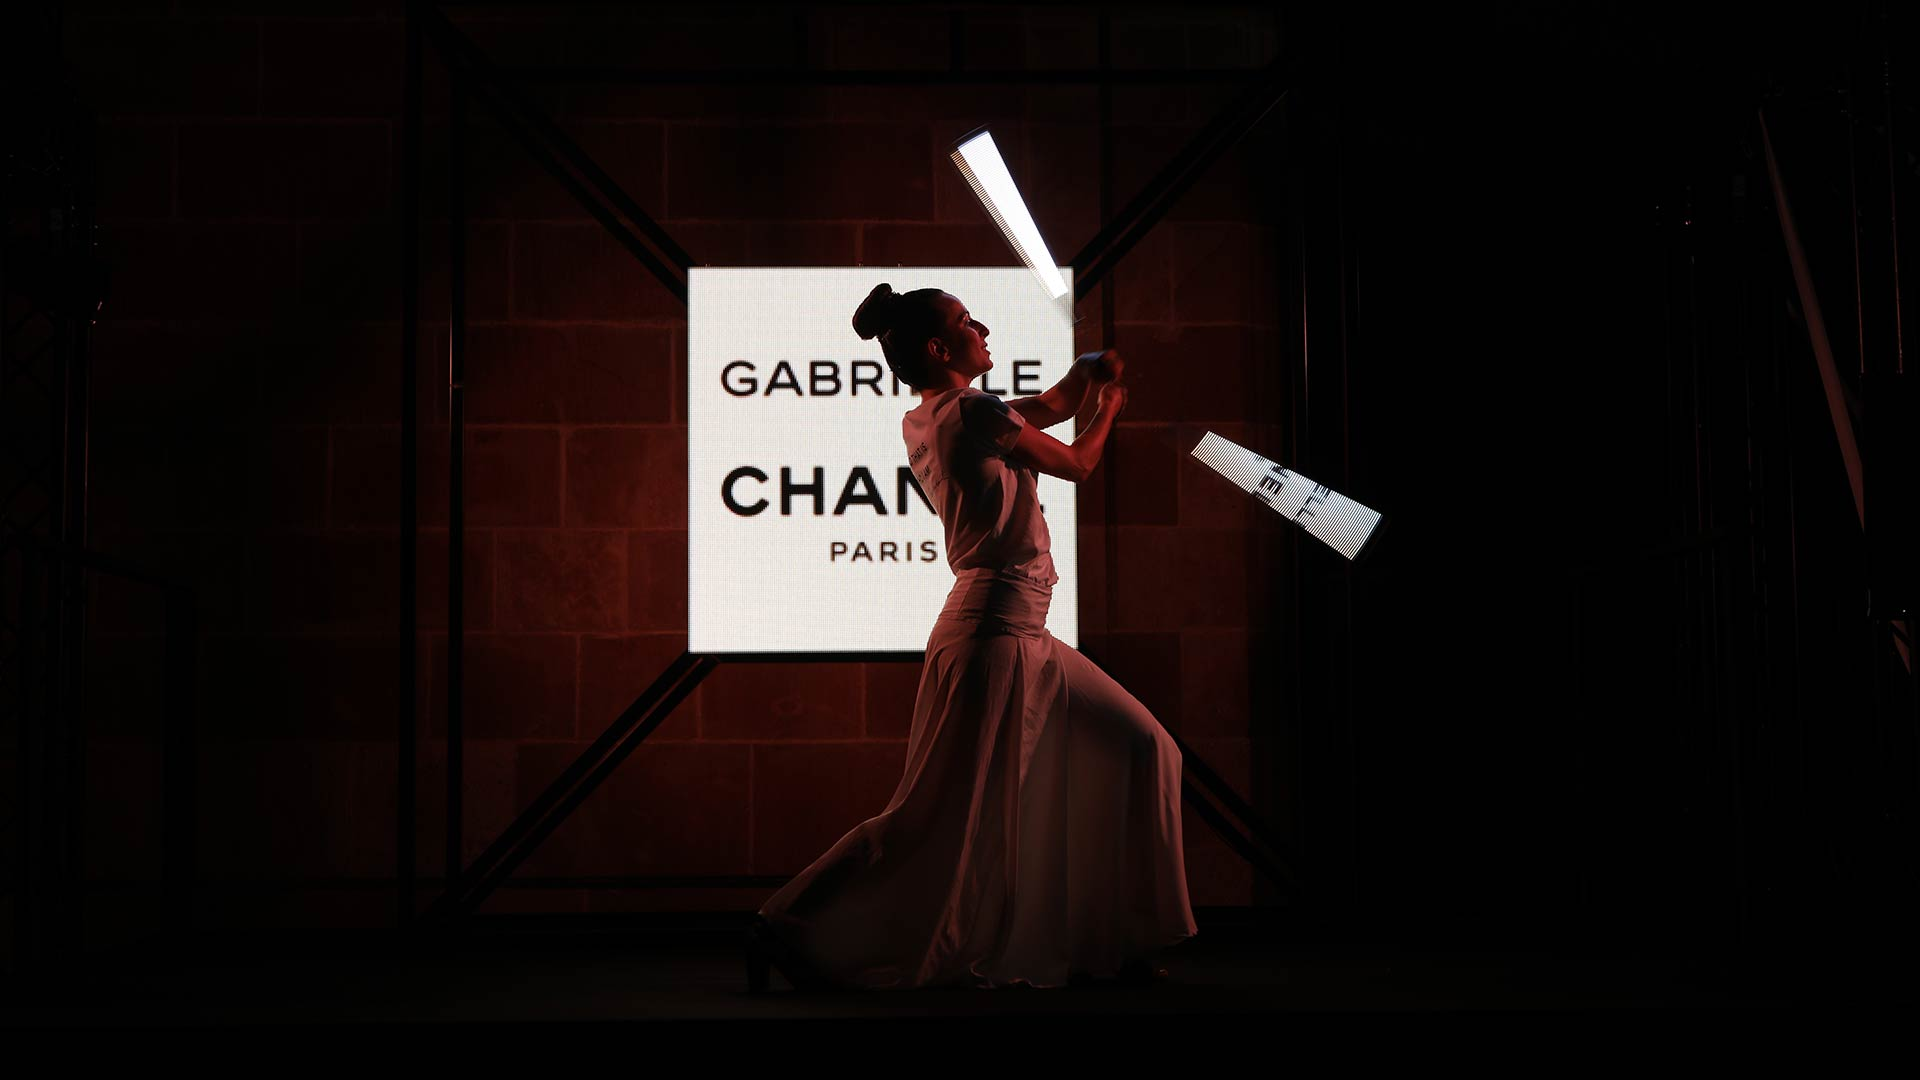 Chanel perfume presentation event hiring performance